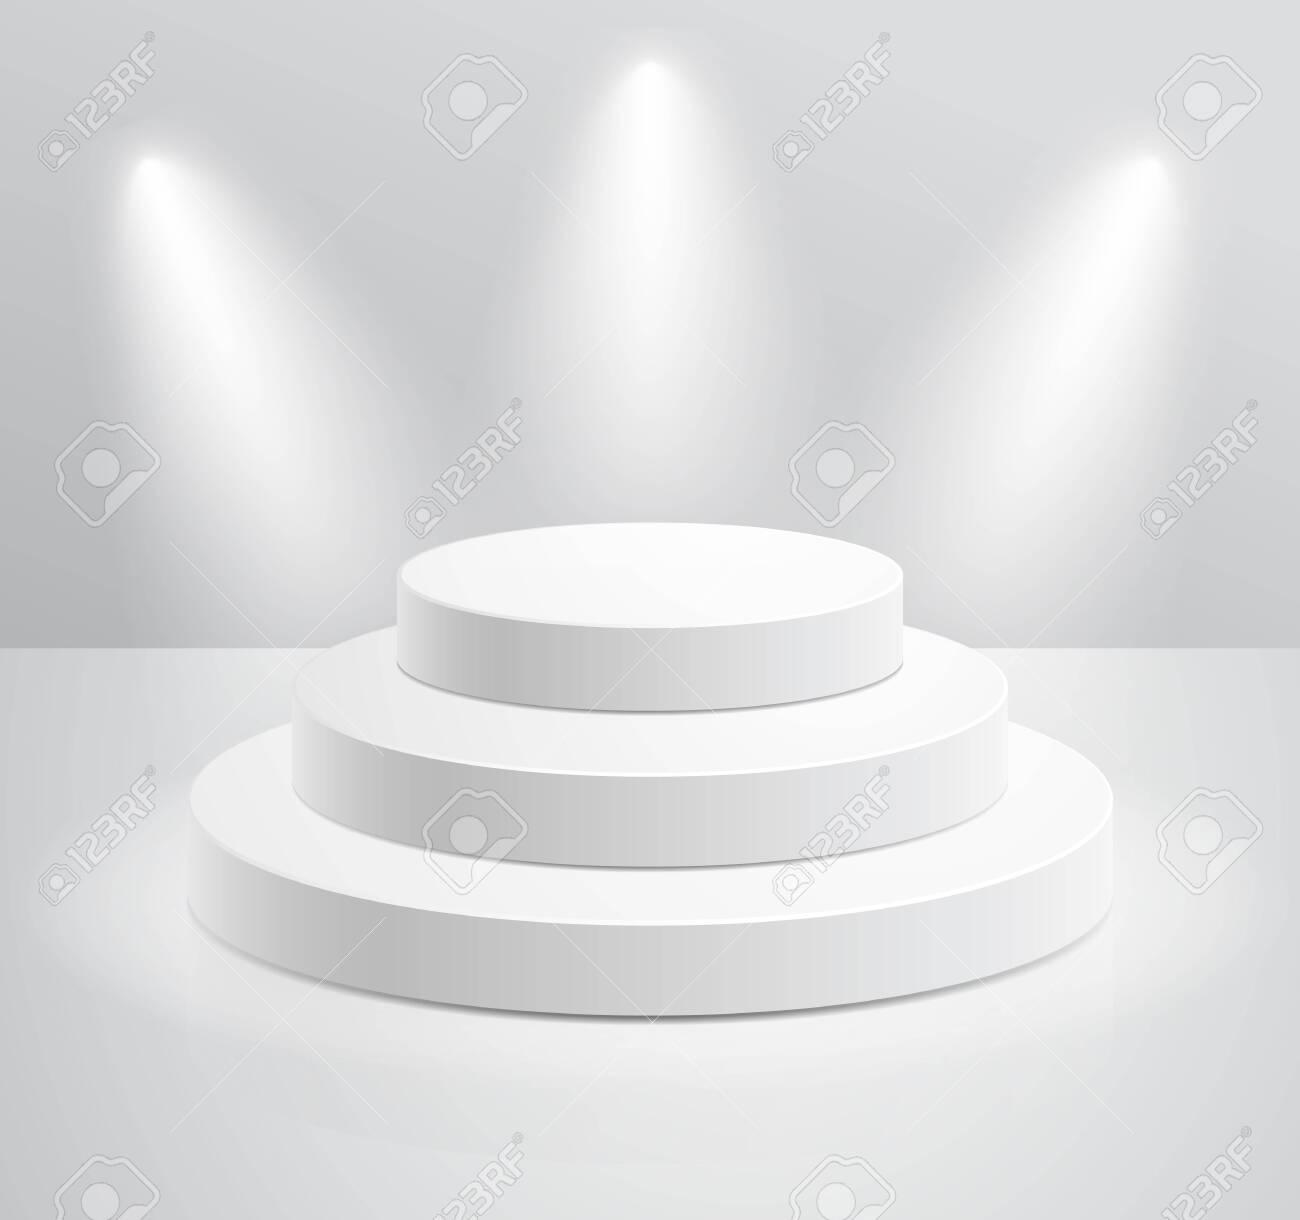 Podium with spotlight vector illustrations. - 146358416